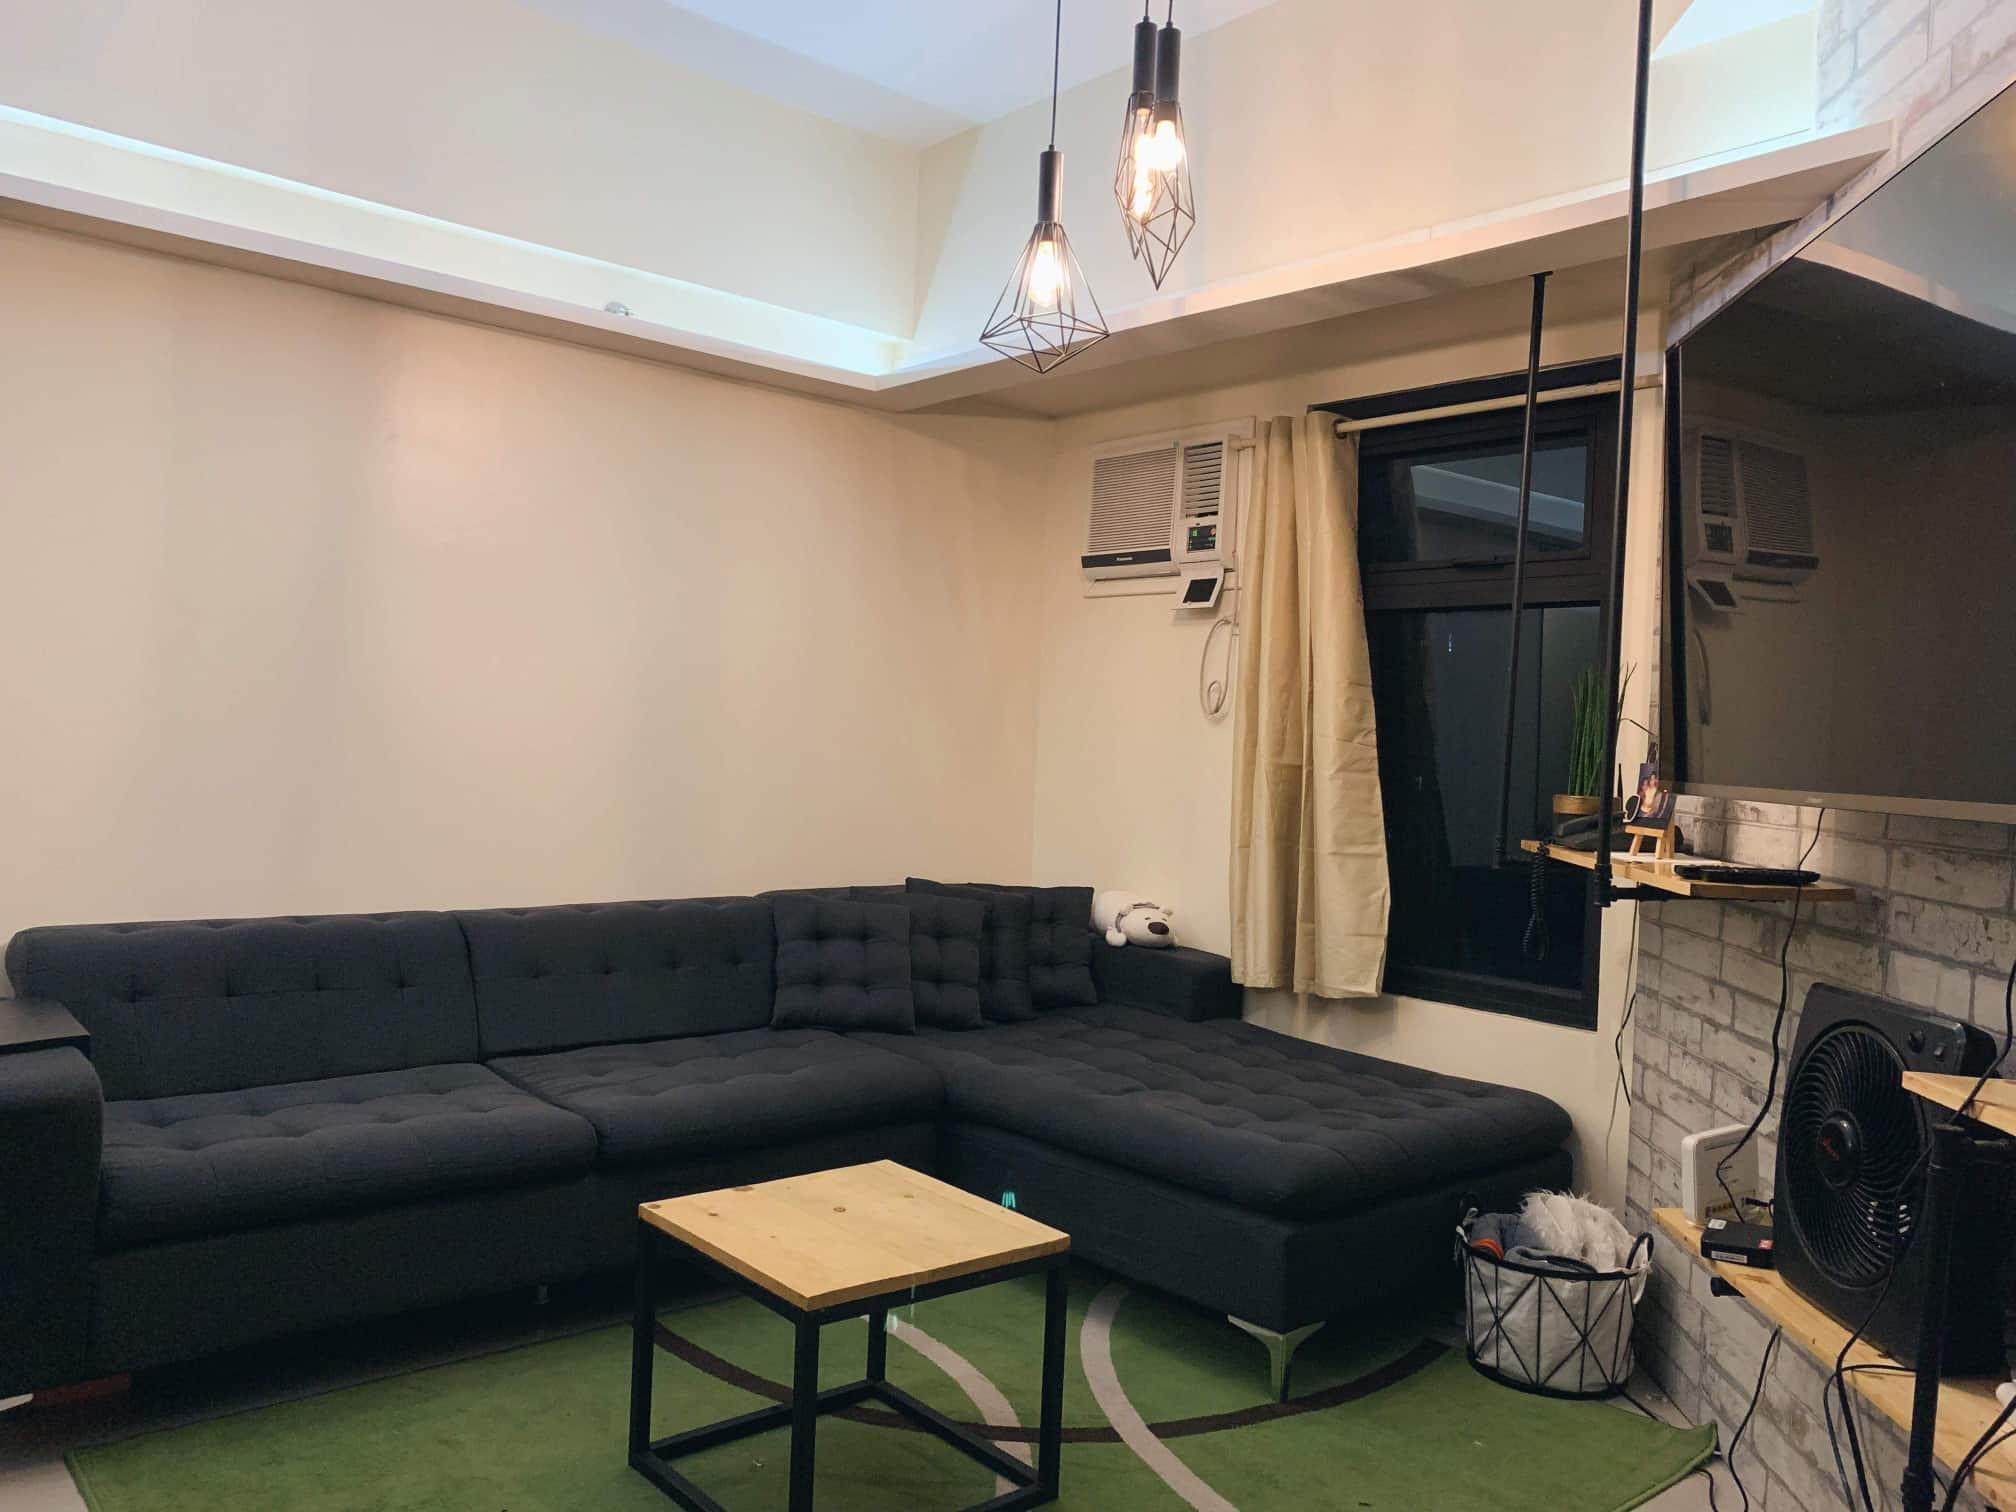 1BR Condominium in Trion Tower for Rent